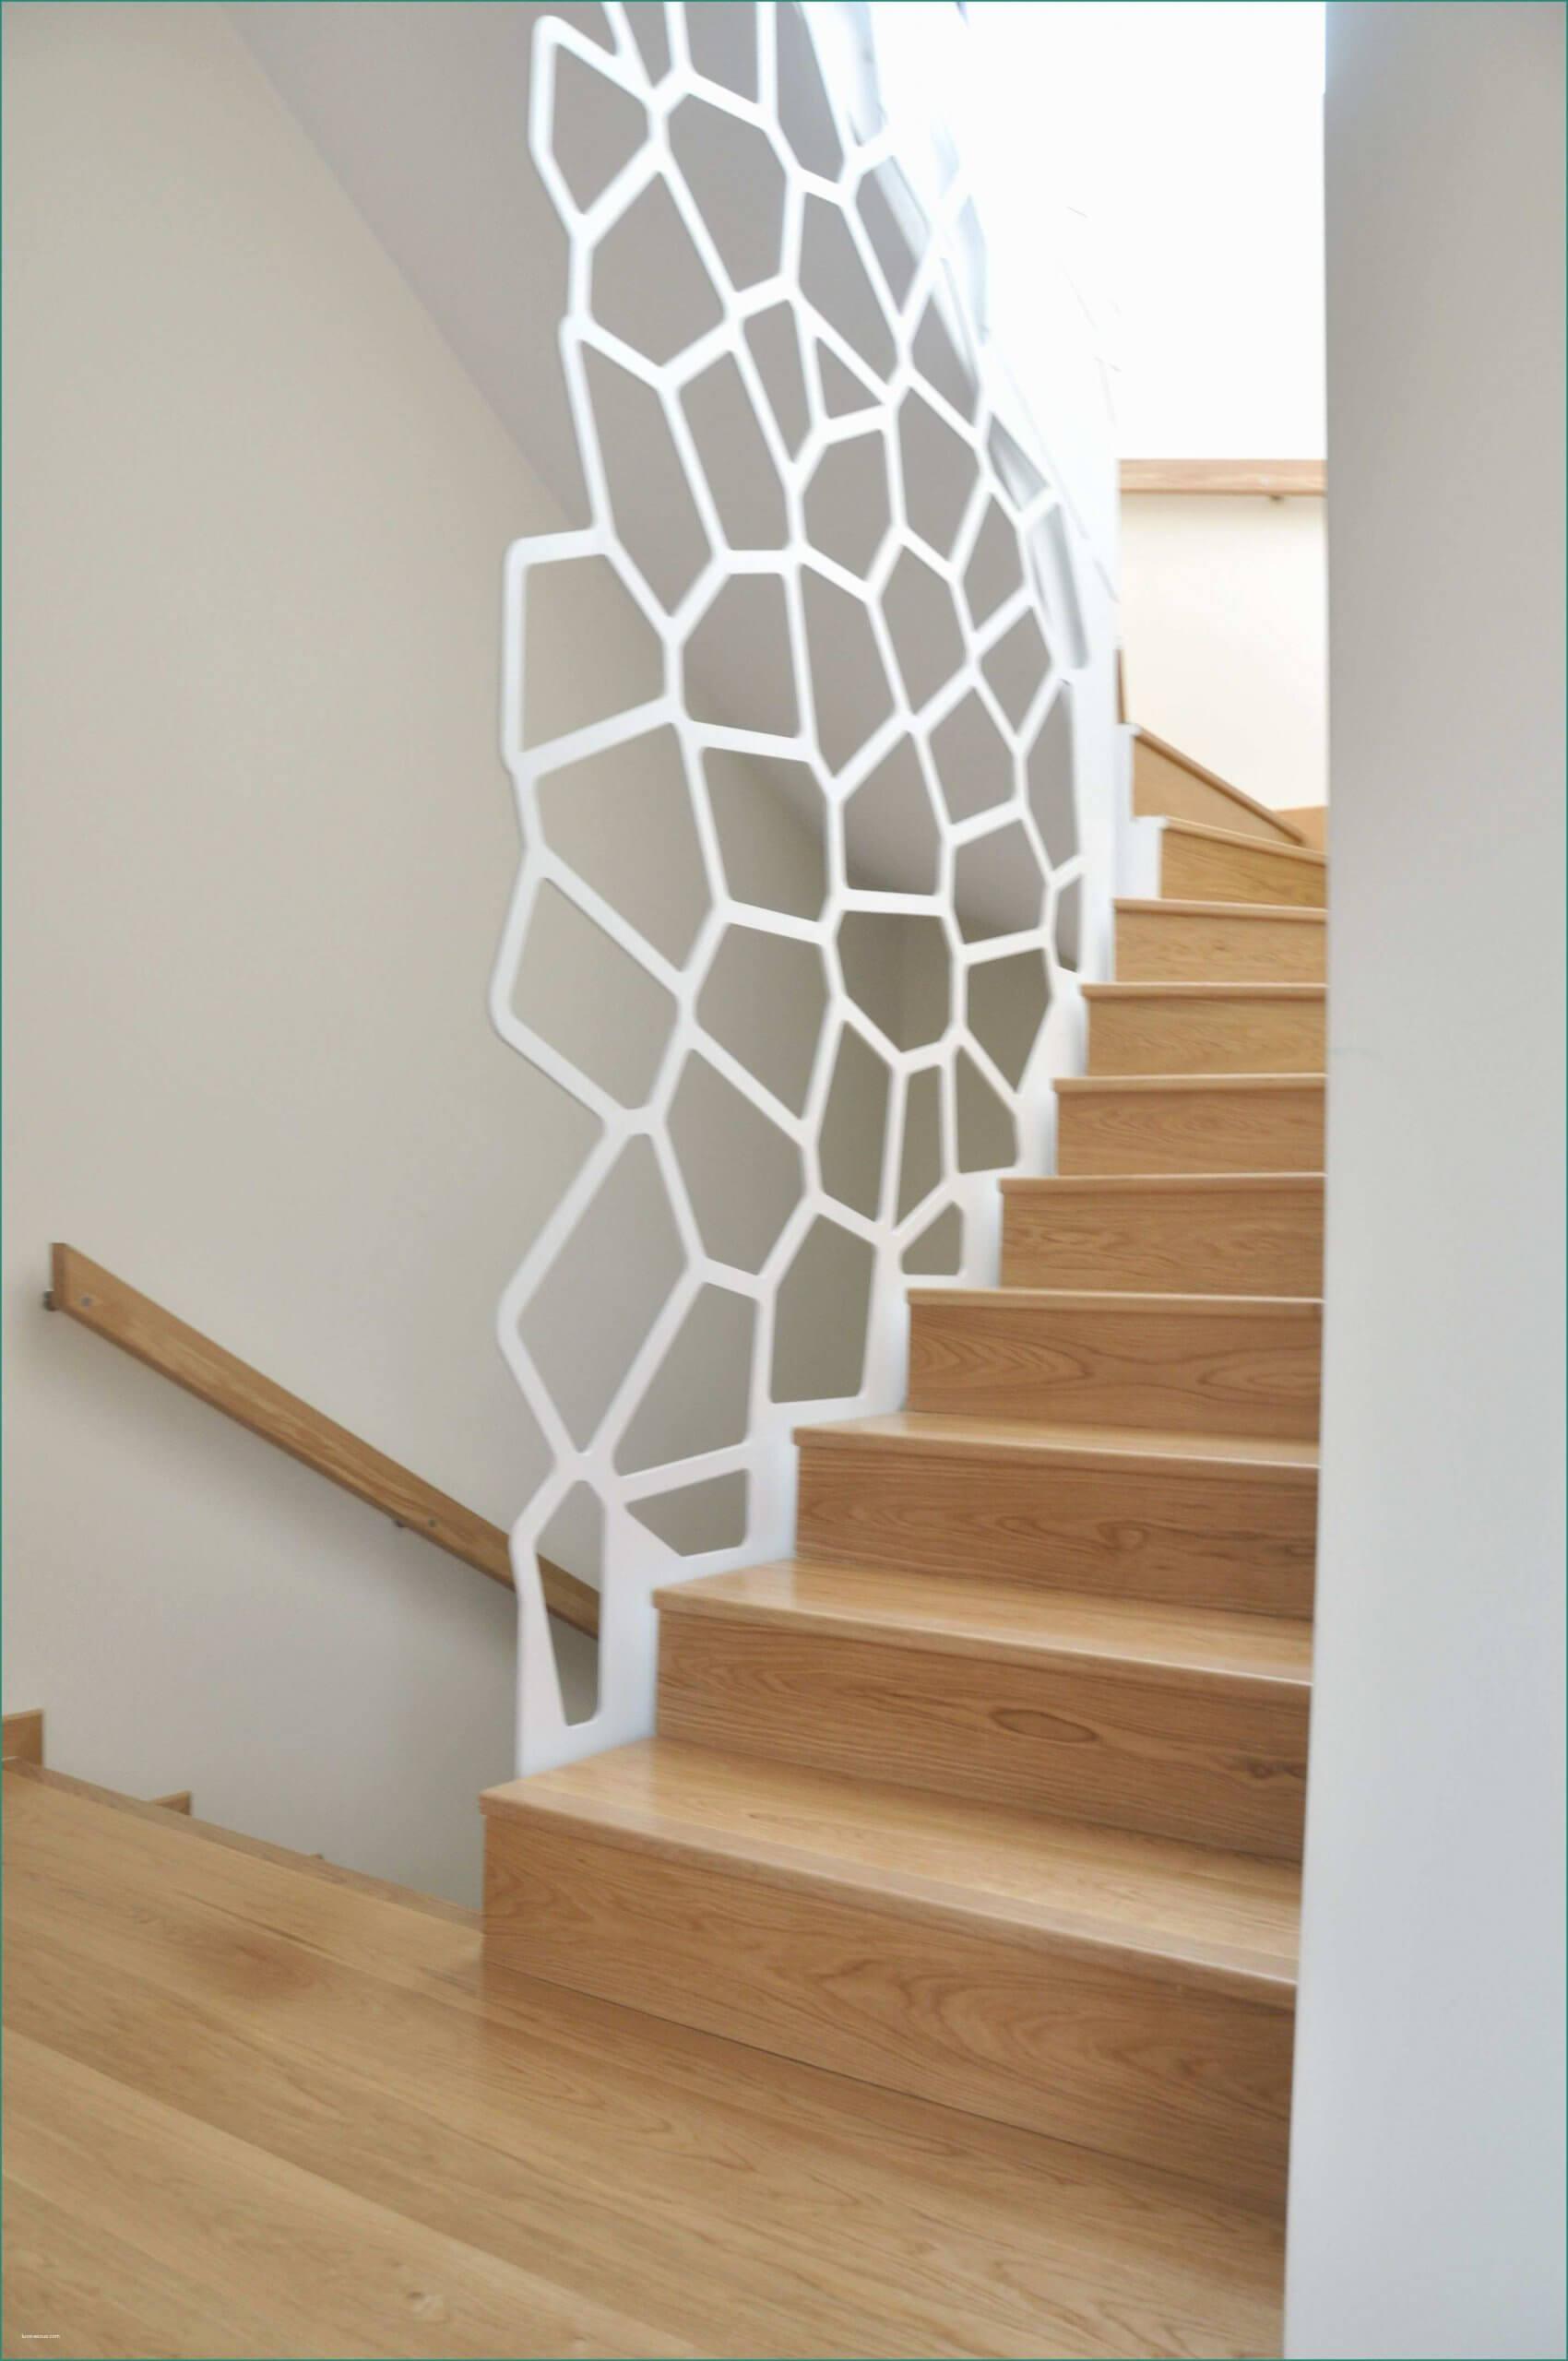 ev içi merdiven modelleri